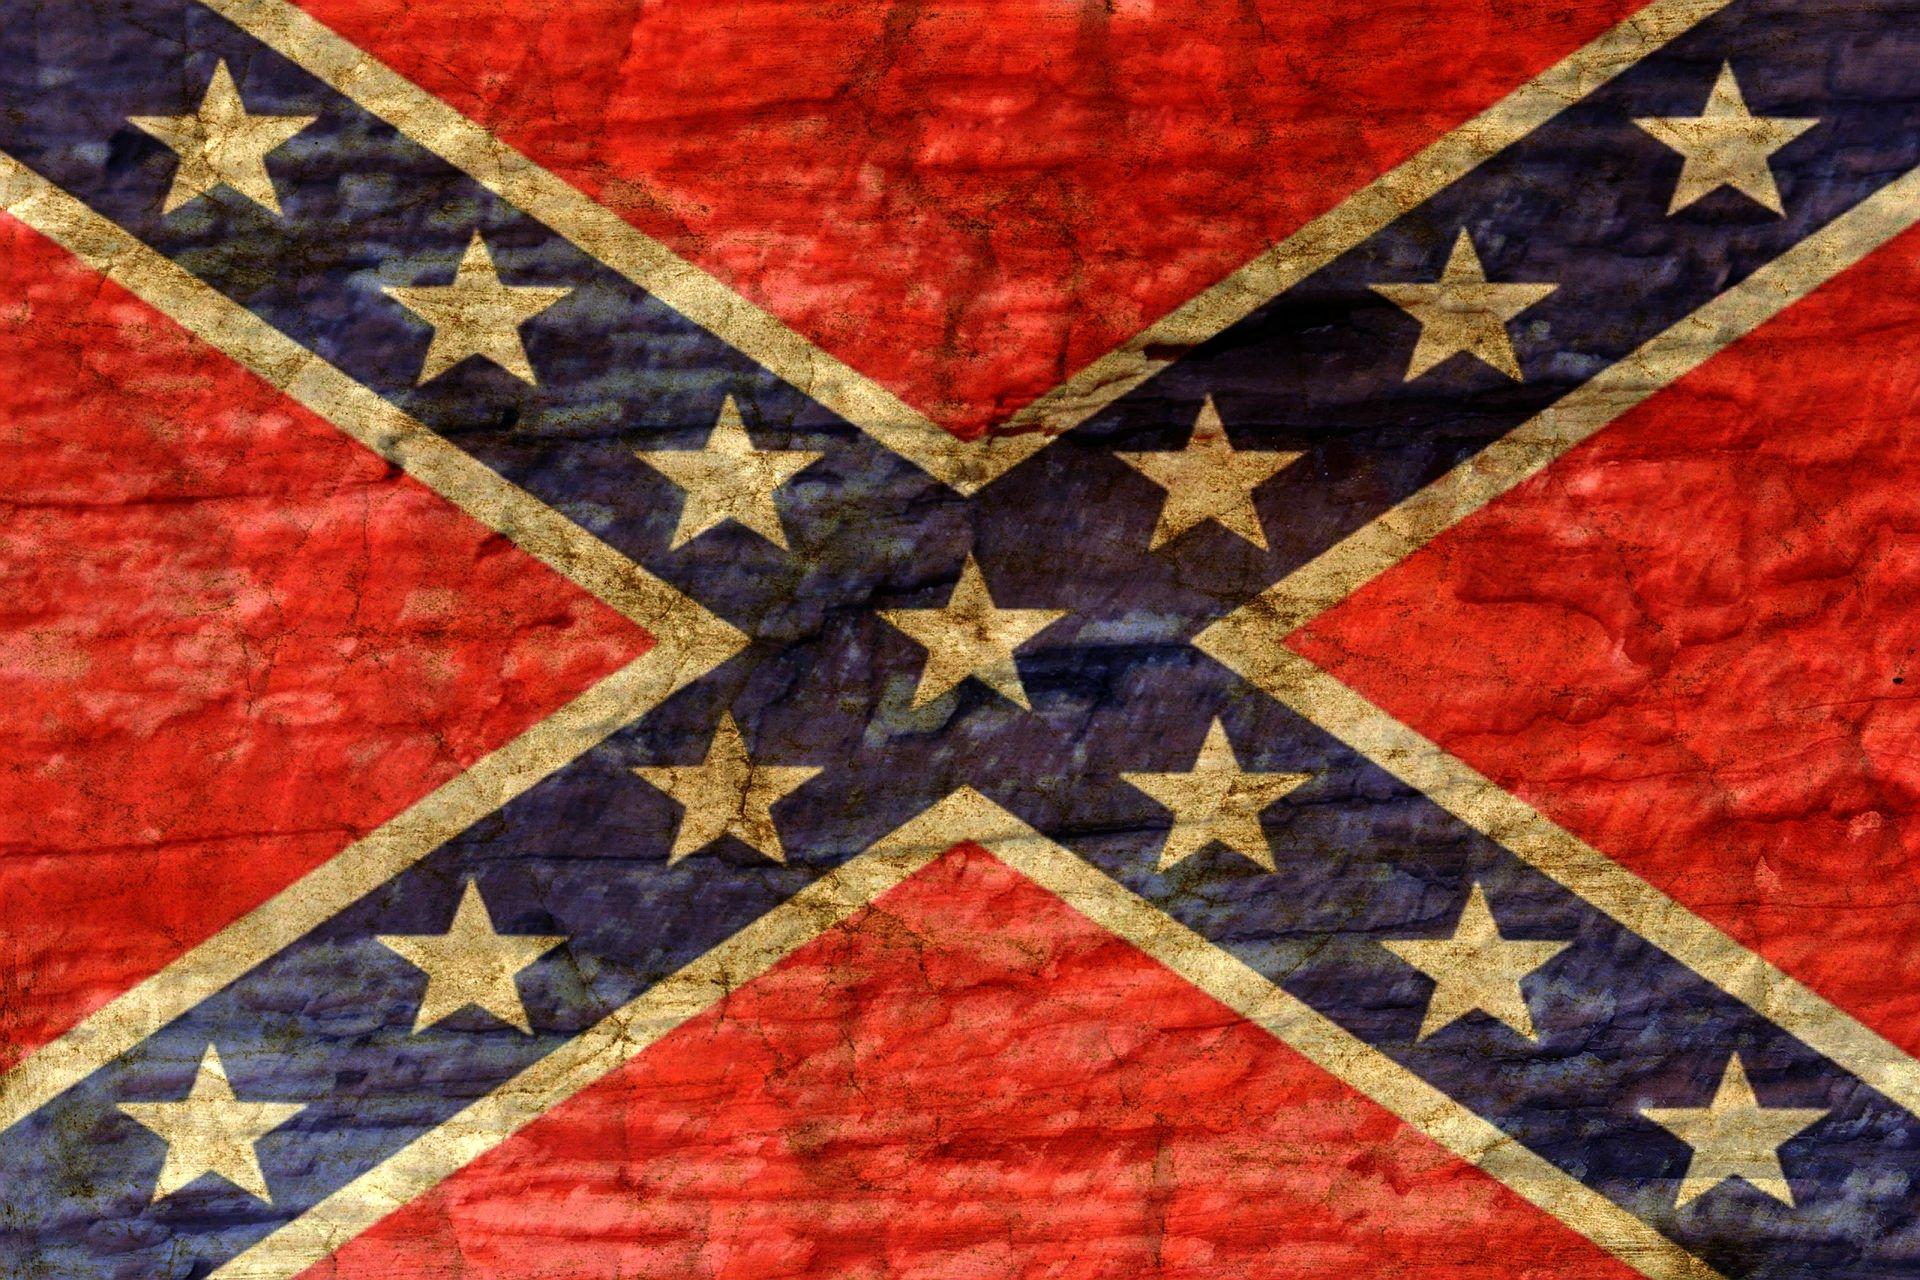 CONFEDERATE flag usa america united states csa civil war 1920x1280